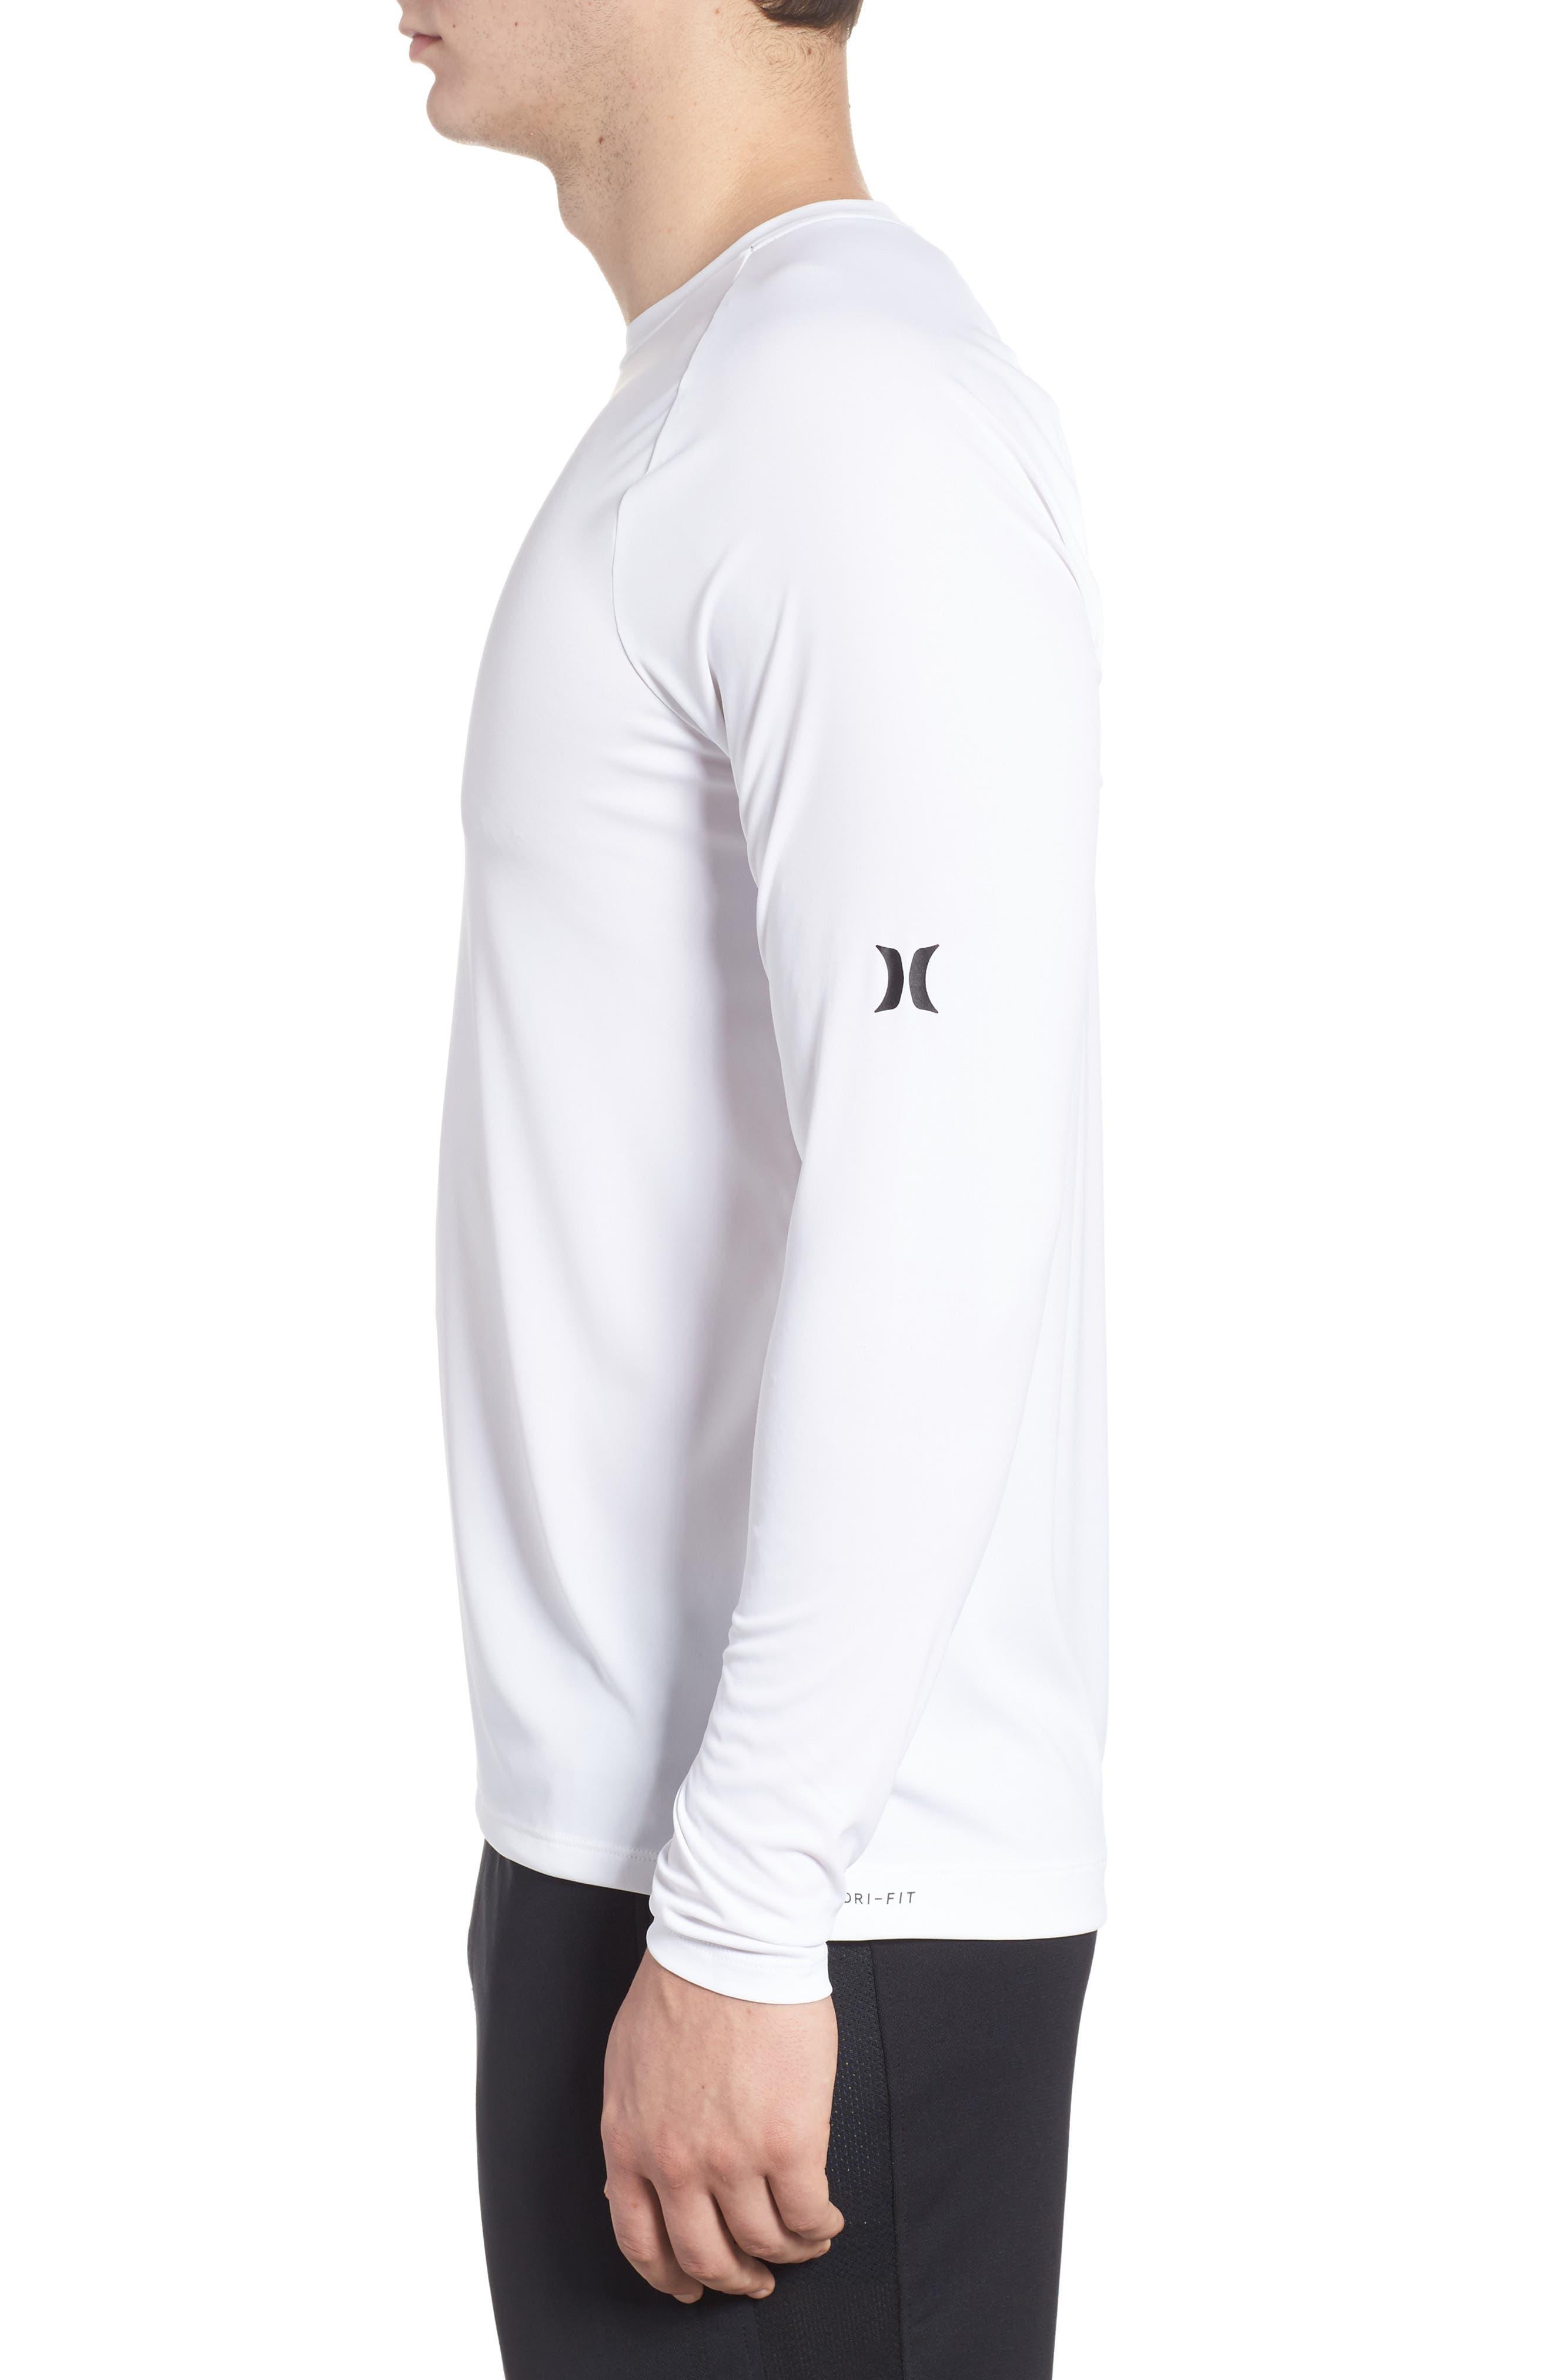 Icon Surf Shirt,                             Alternate thumbnail 3, color,                             White